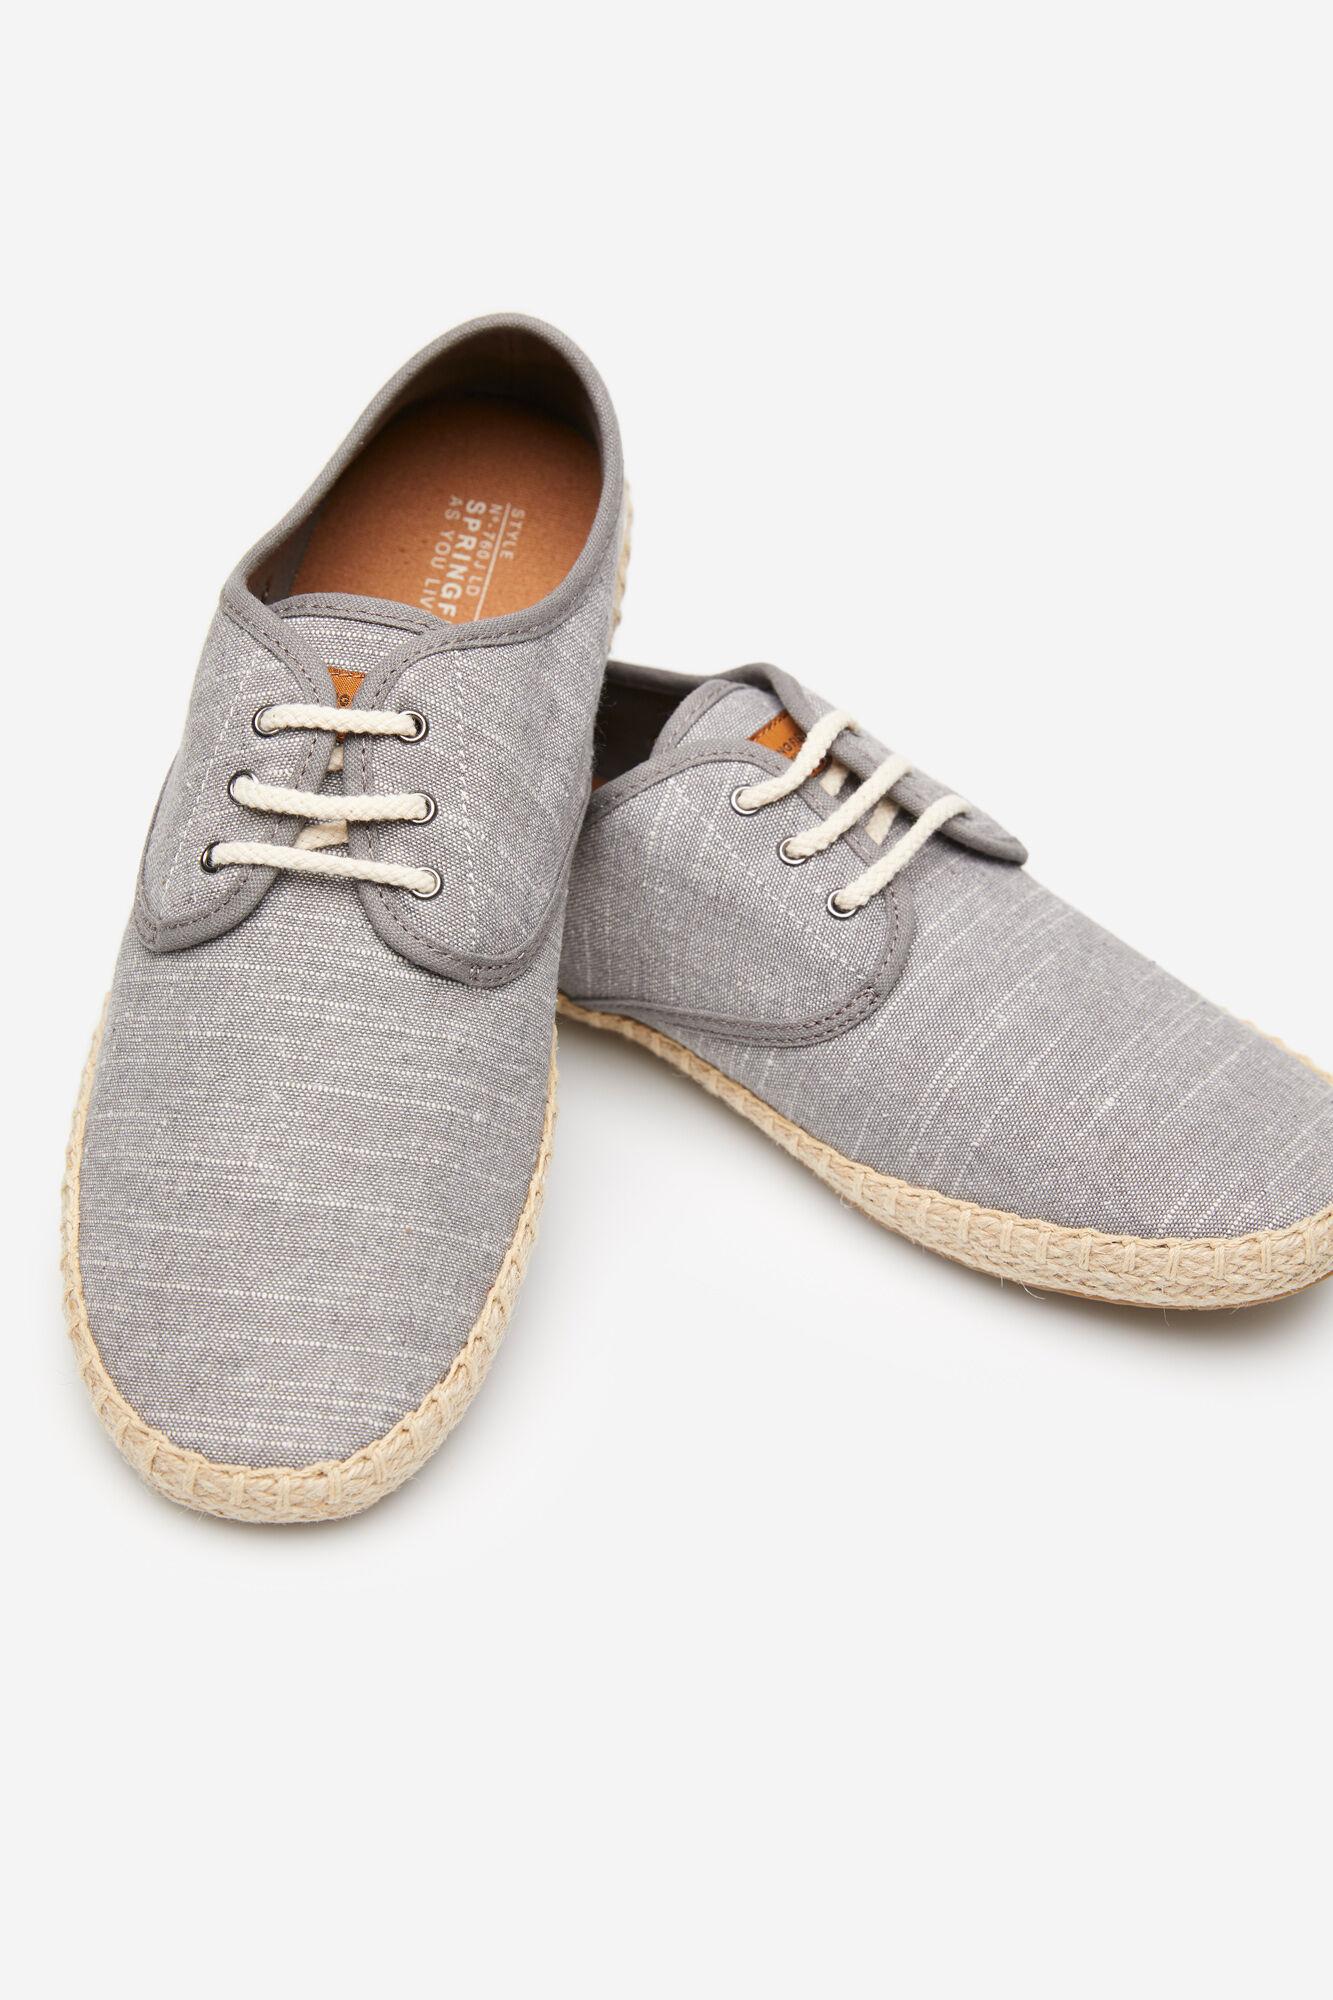 mirada detallada 3f4e3 448b9 Alpargata cordones | Zapatos | Springfield